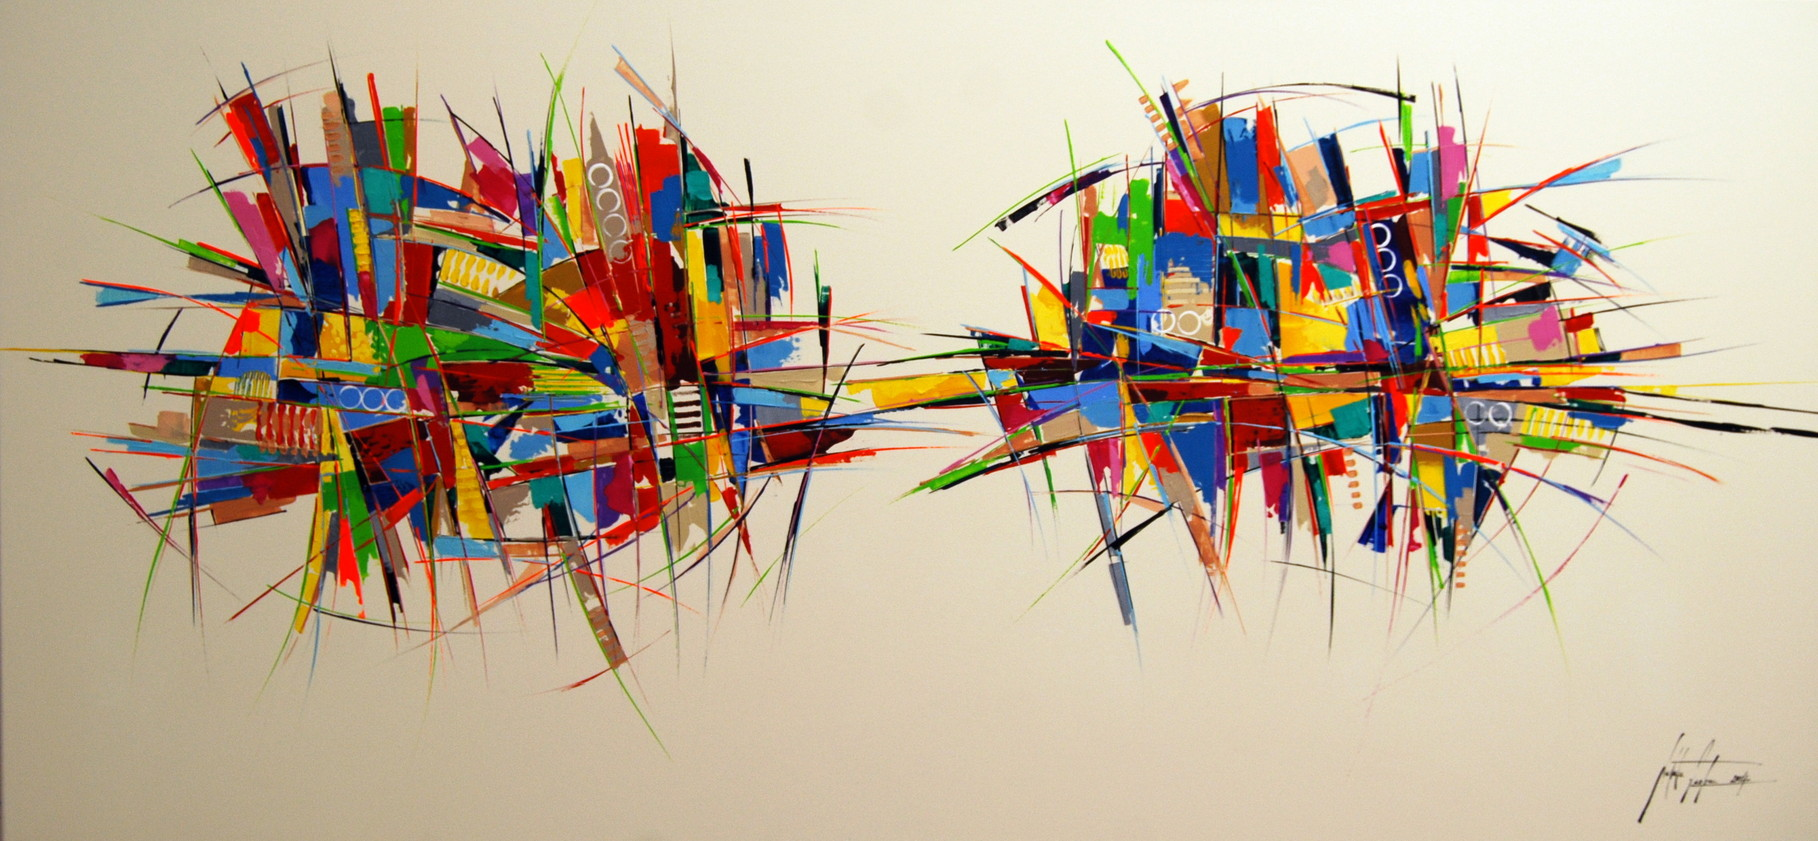 160 x 70cm Acryl auf Leinwand, Galeriekeilrahmen.